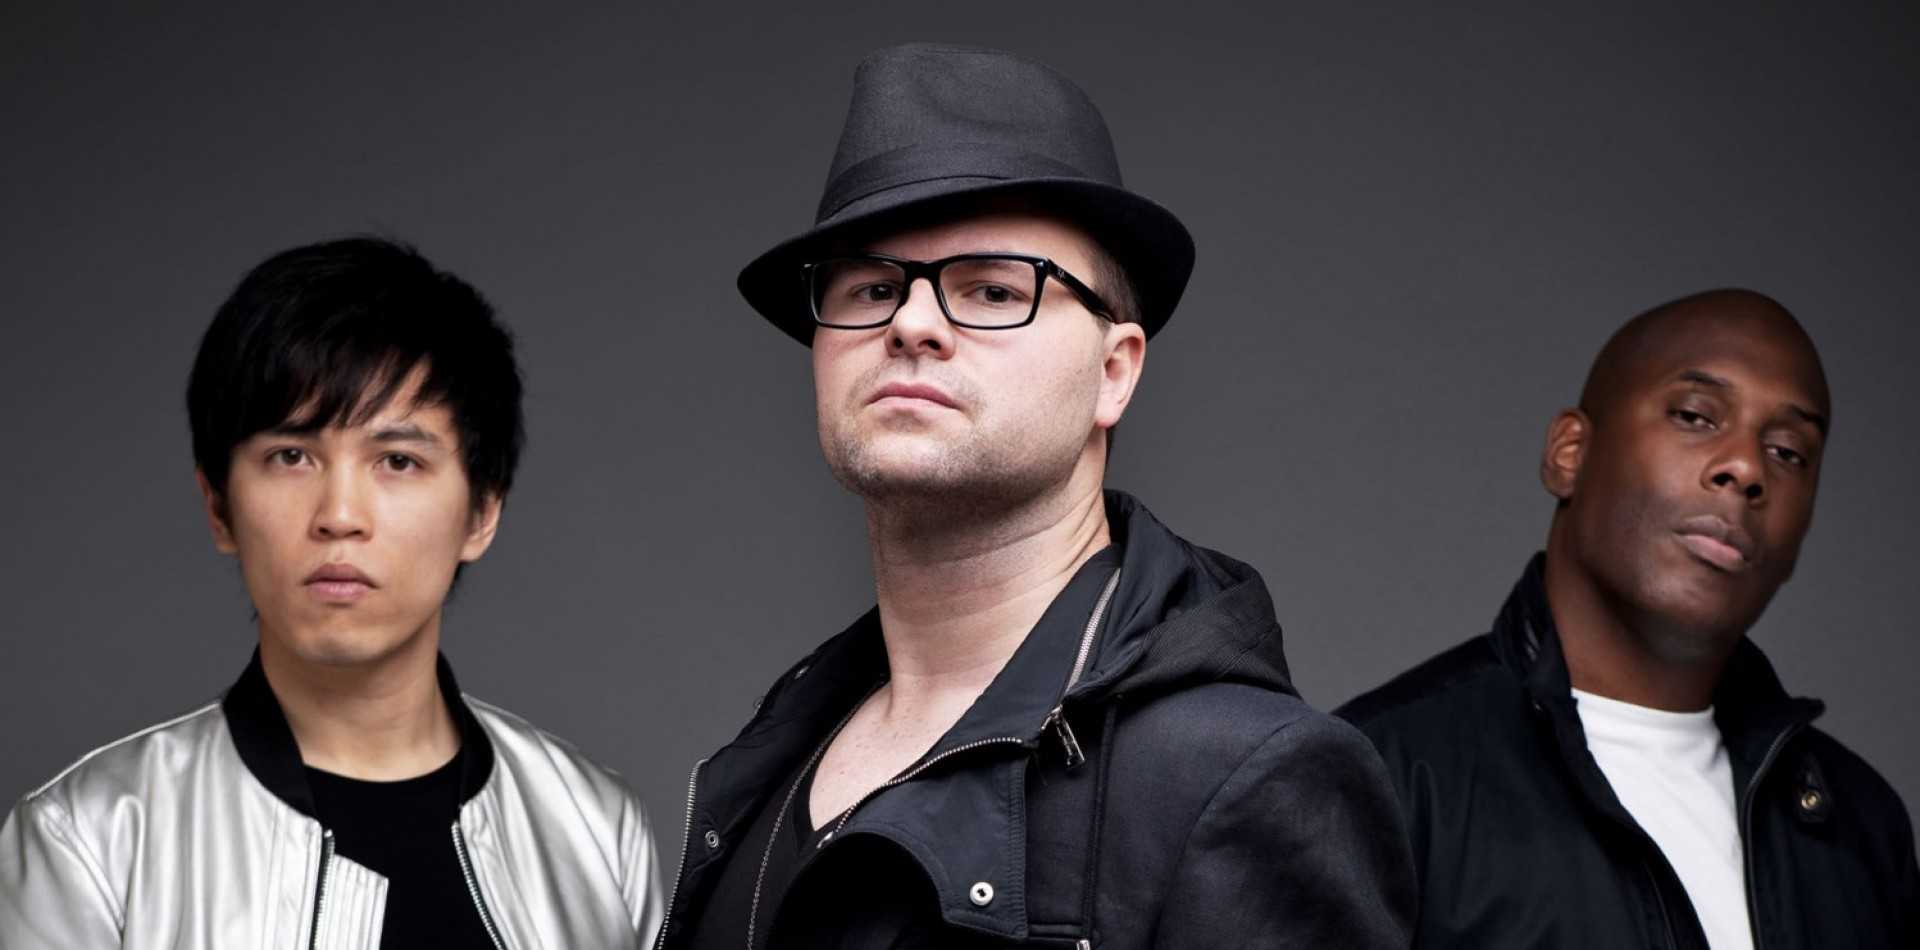 Entertaining pop-rock-funk download from Magazine Gap – 'Body Language', The Non-Modern Man | Unfashionablemale